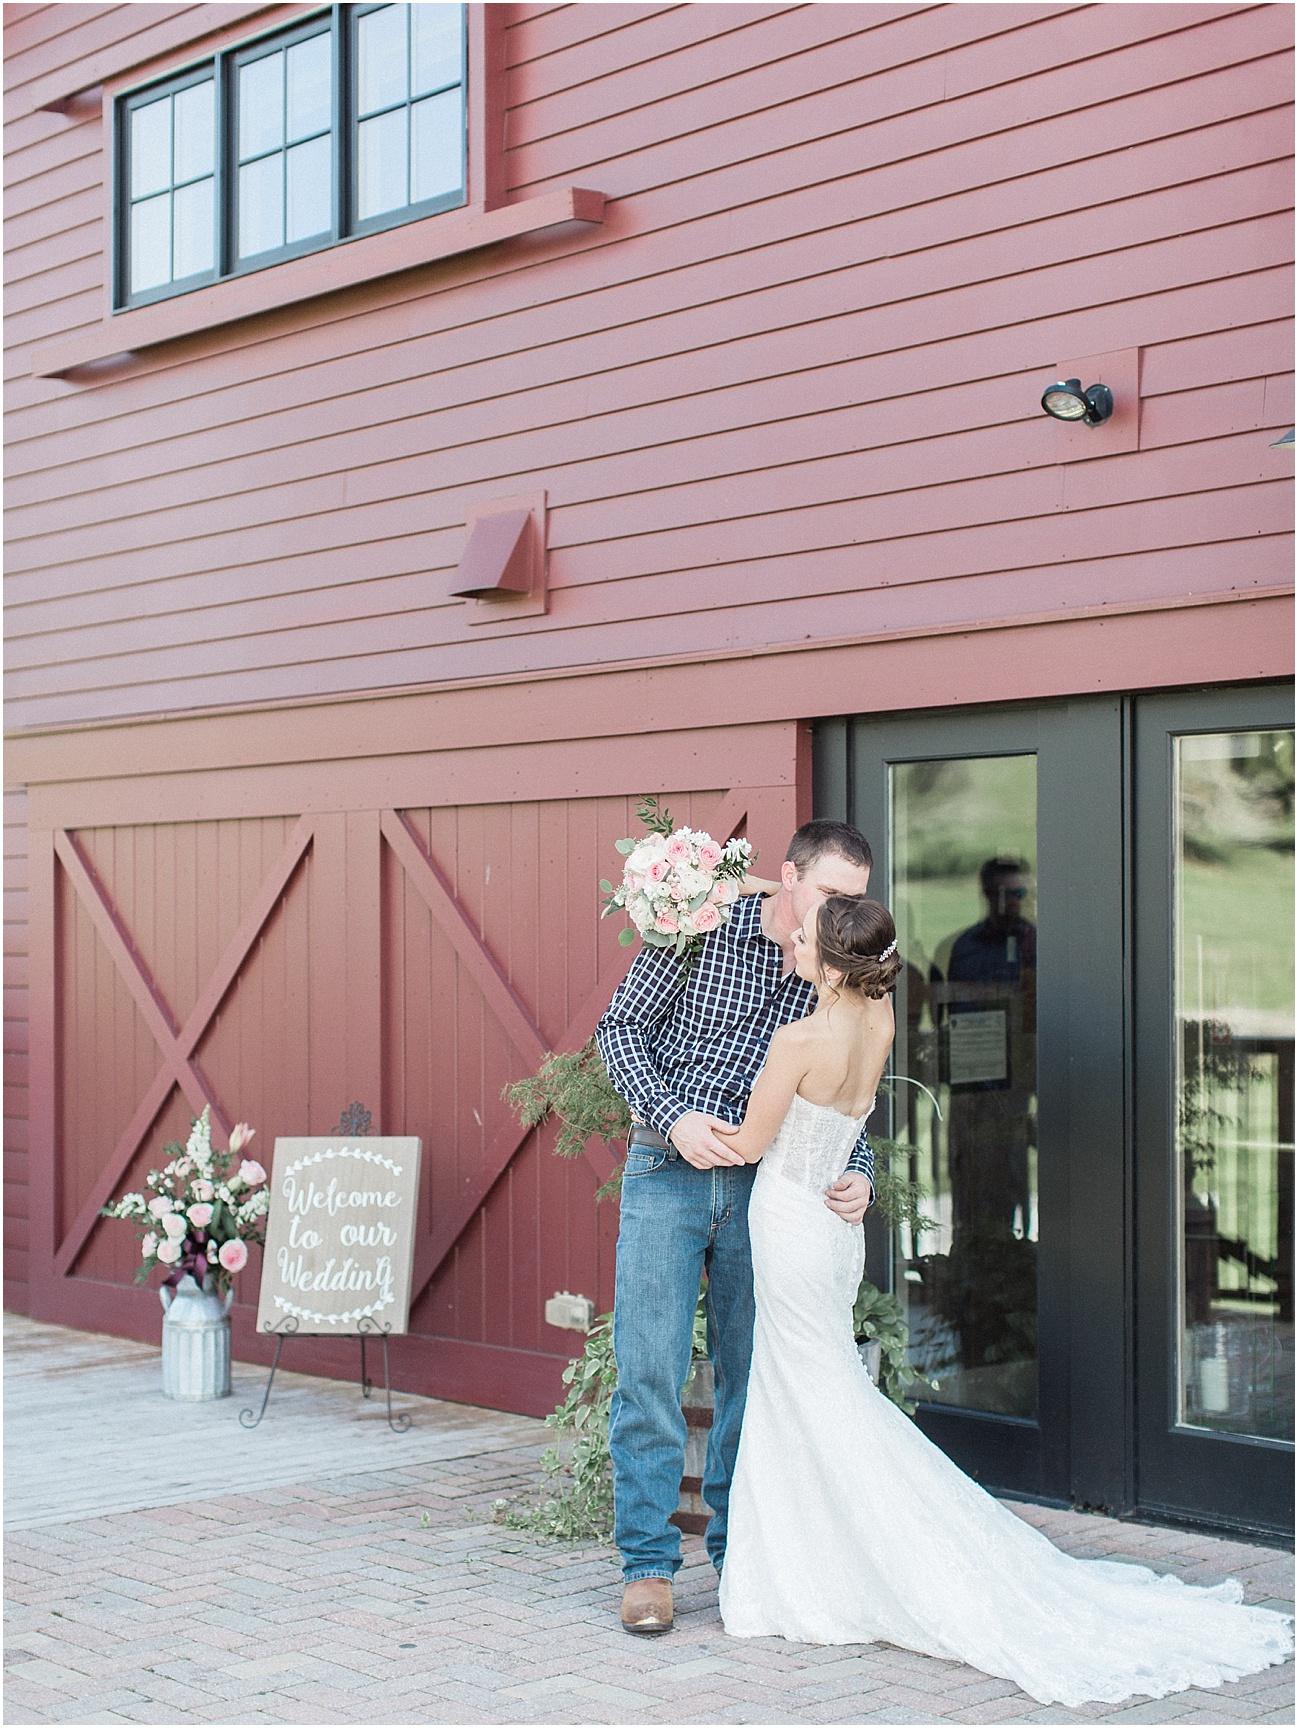 jackie_brad_barn_at_gibbett_hill_country_yellow_lab_fall_burgundy_cape_cod_boston_wedding_photographer_meredith_jane_photography_photo_1020.jpg